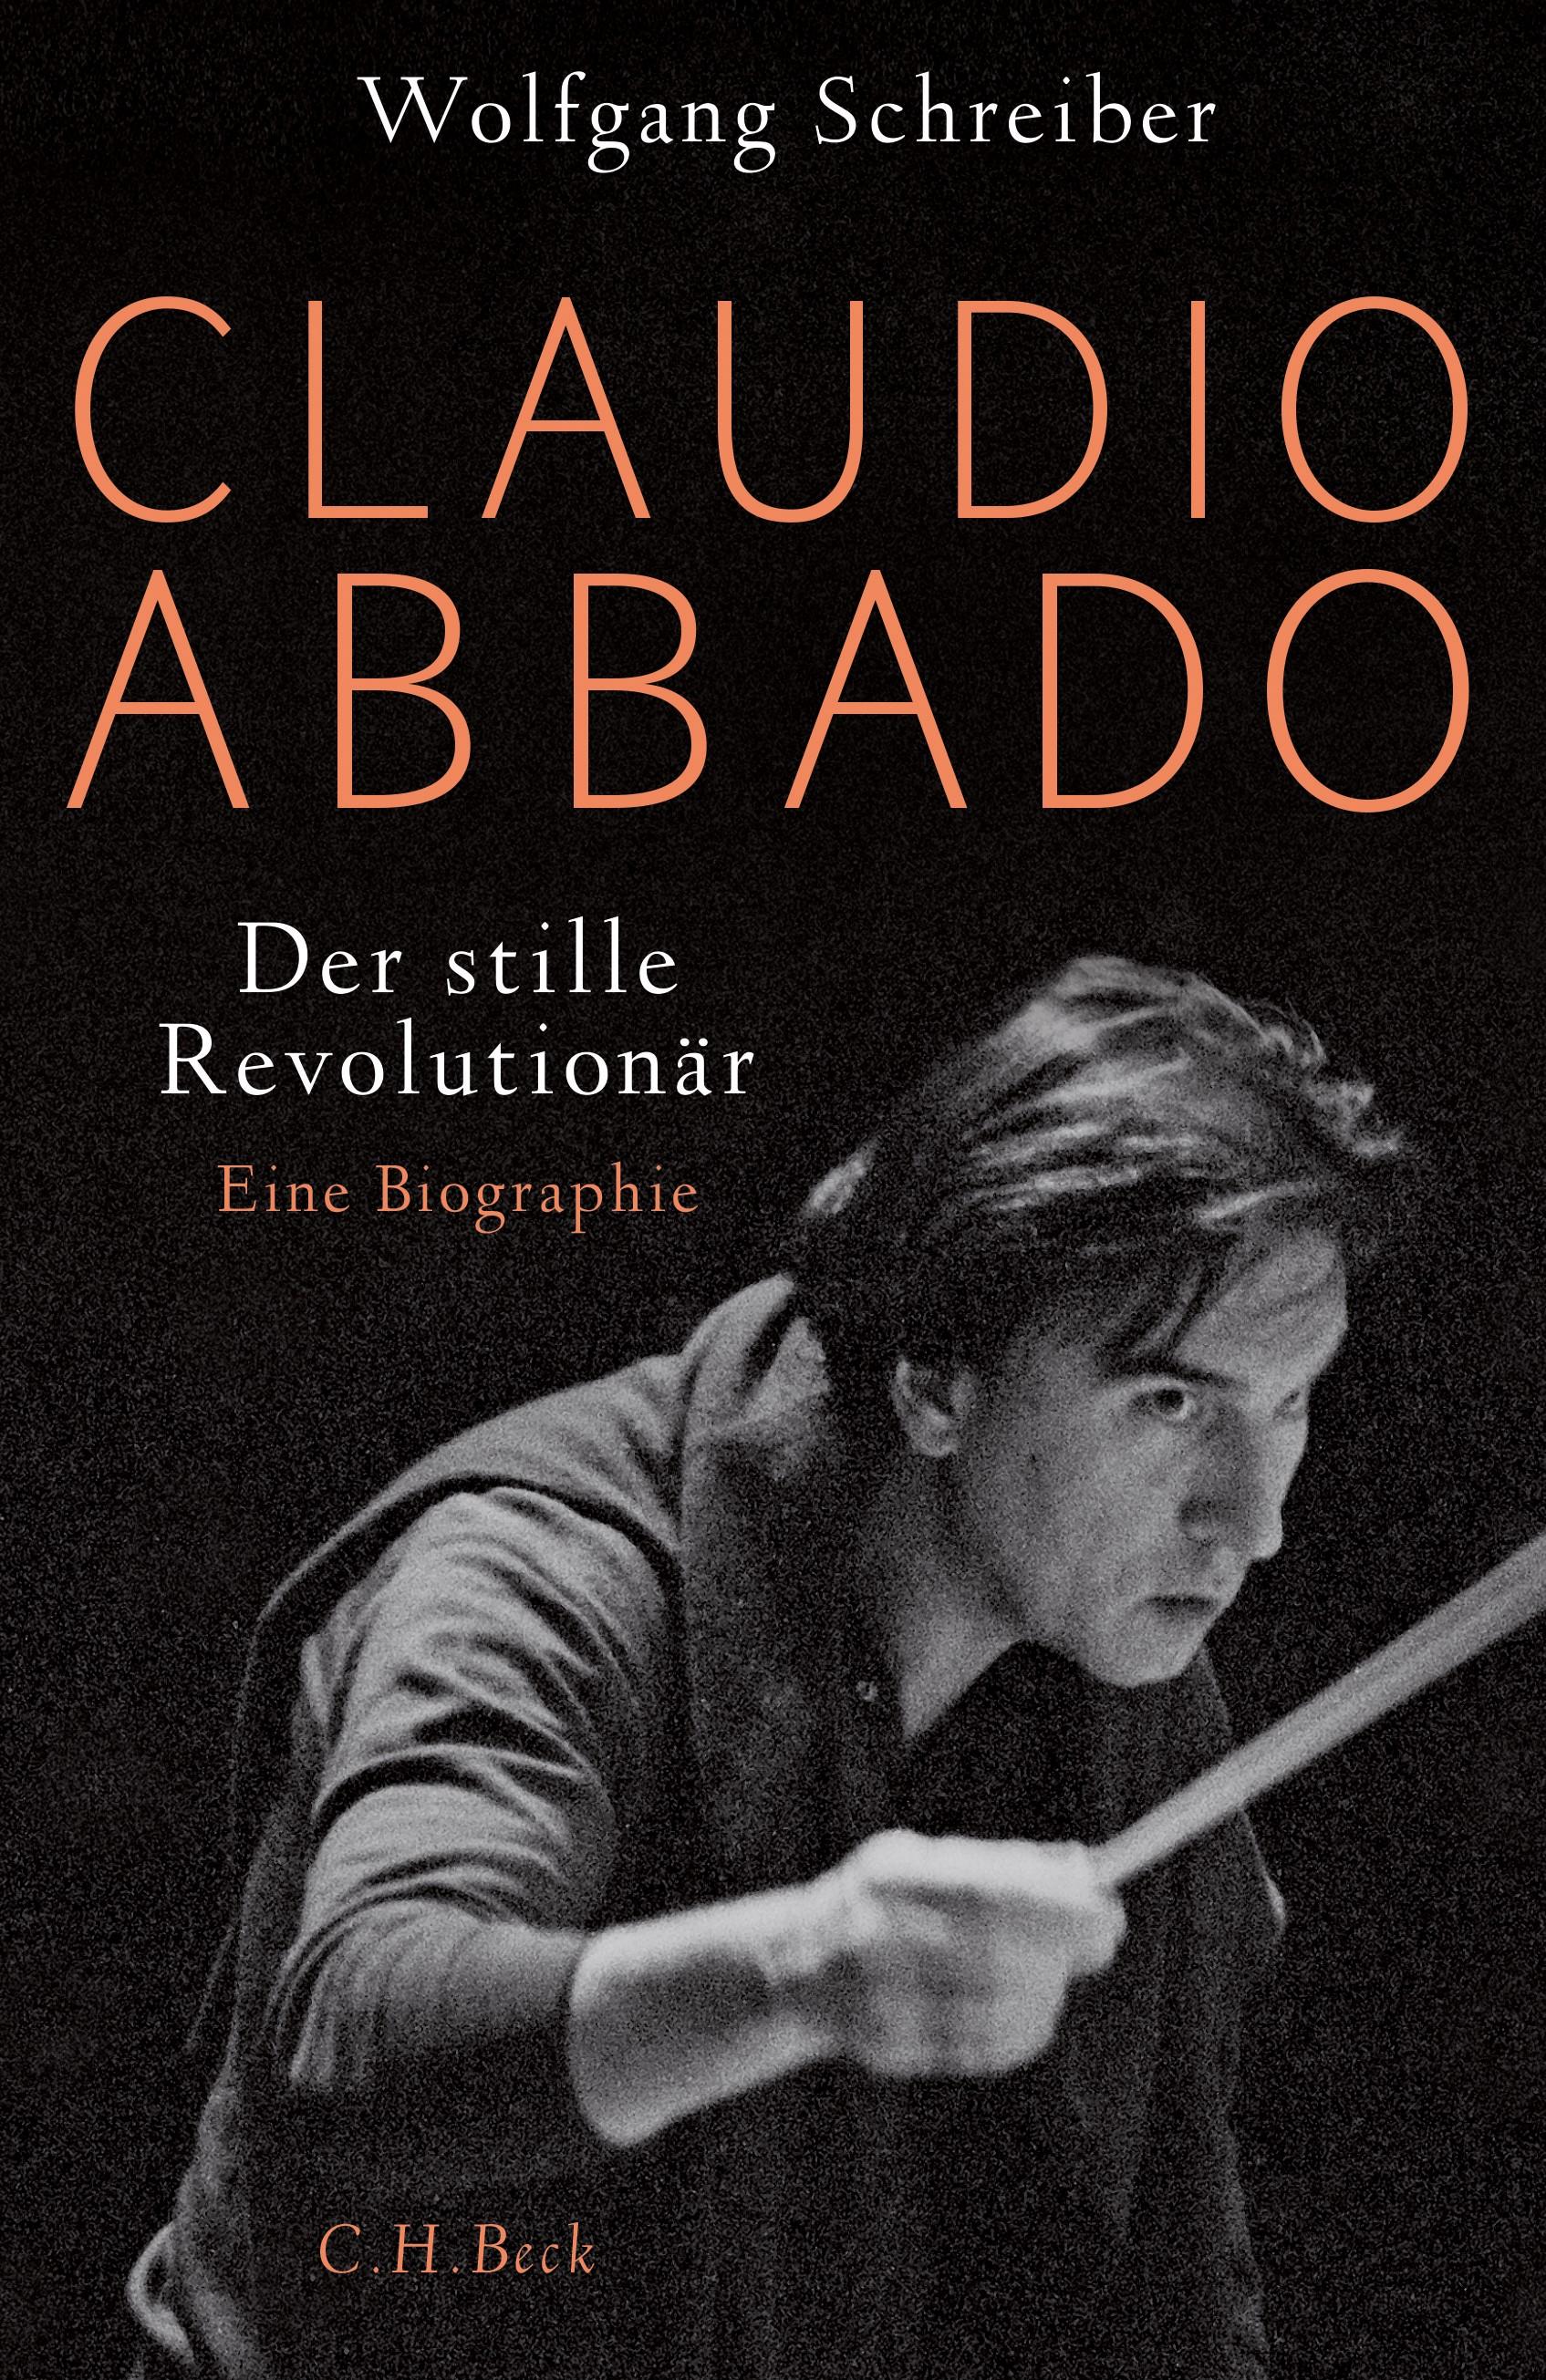 Claudio Abbado | Schreiber, Wolfgang, 2019 | Buch (Cover)